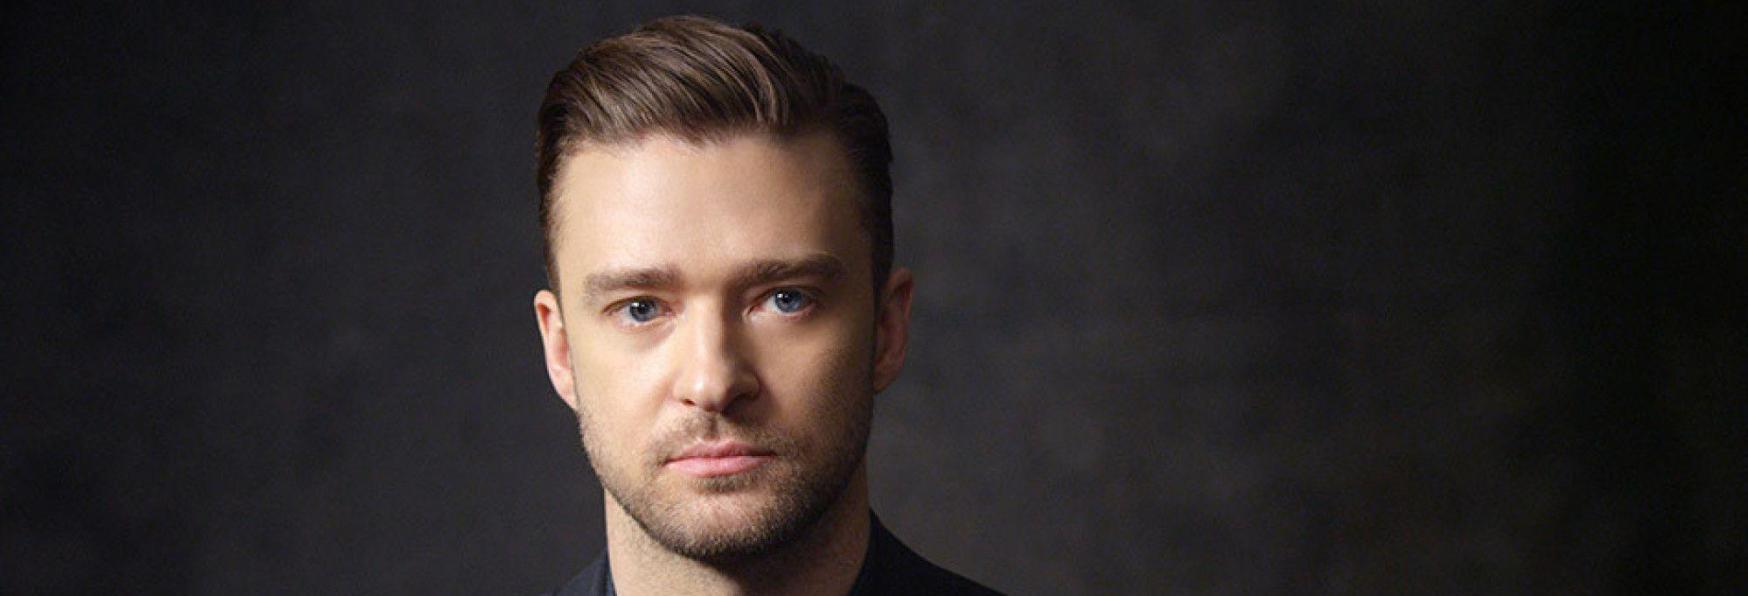 Justin Timberlake sarà il Protagonista di una nuova Serie TV Drammatica per Apple TV+